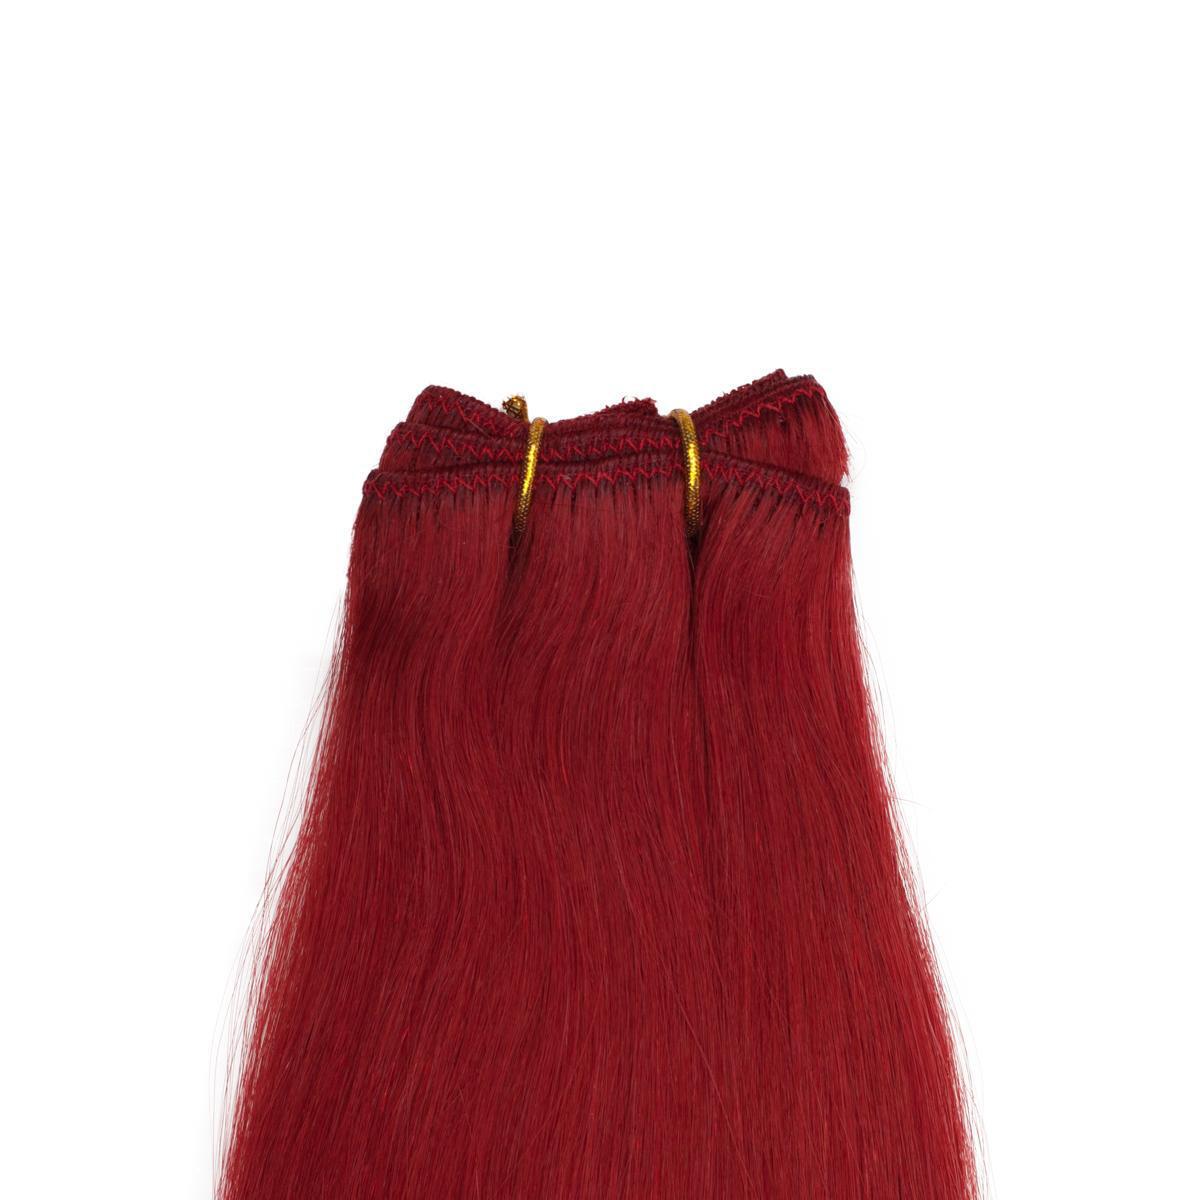 Hair Weft Original 6.0 Red Fire 50 cm